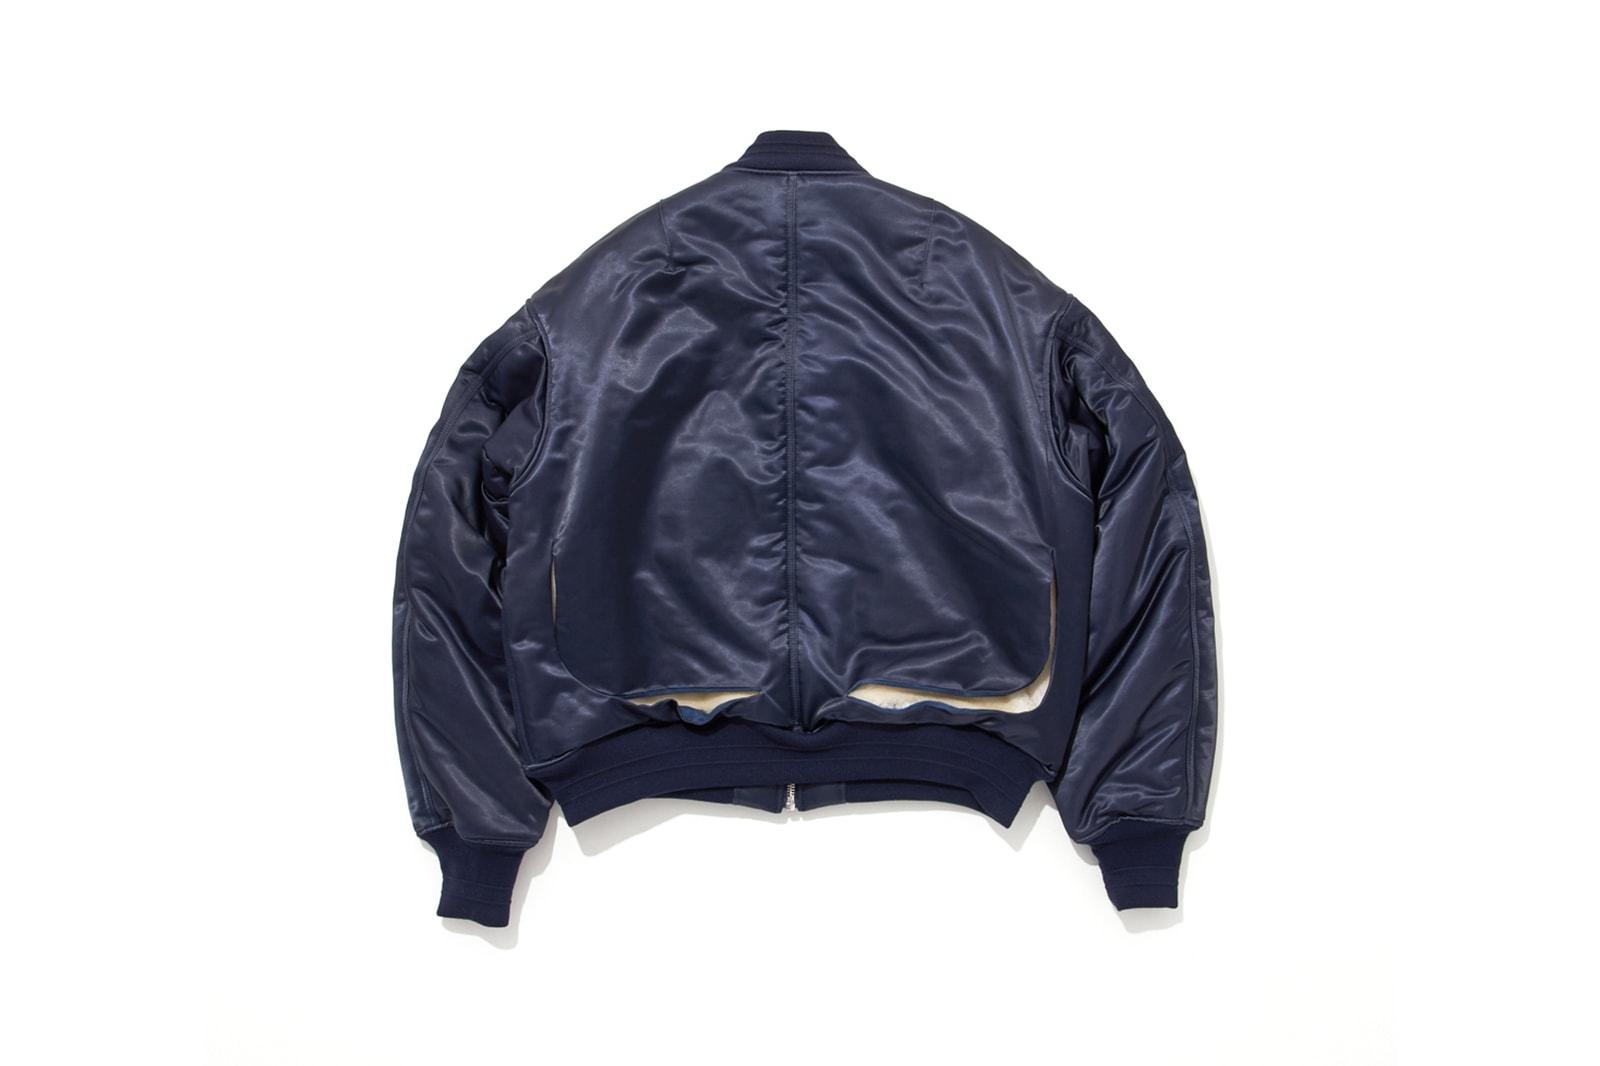 ambush artisanal yoon ahn verbal interview tokyo japan jackets shades jewelry